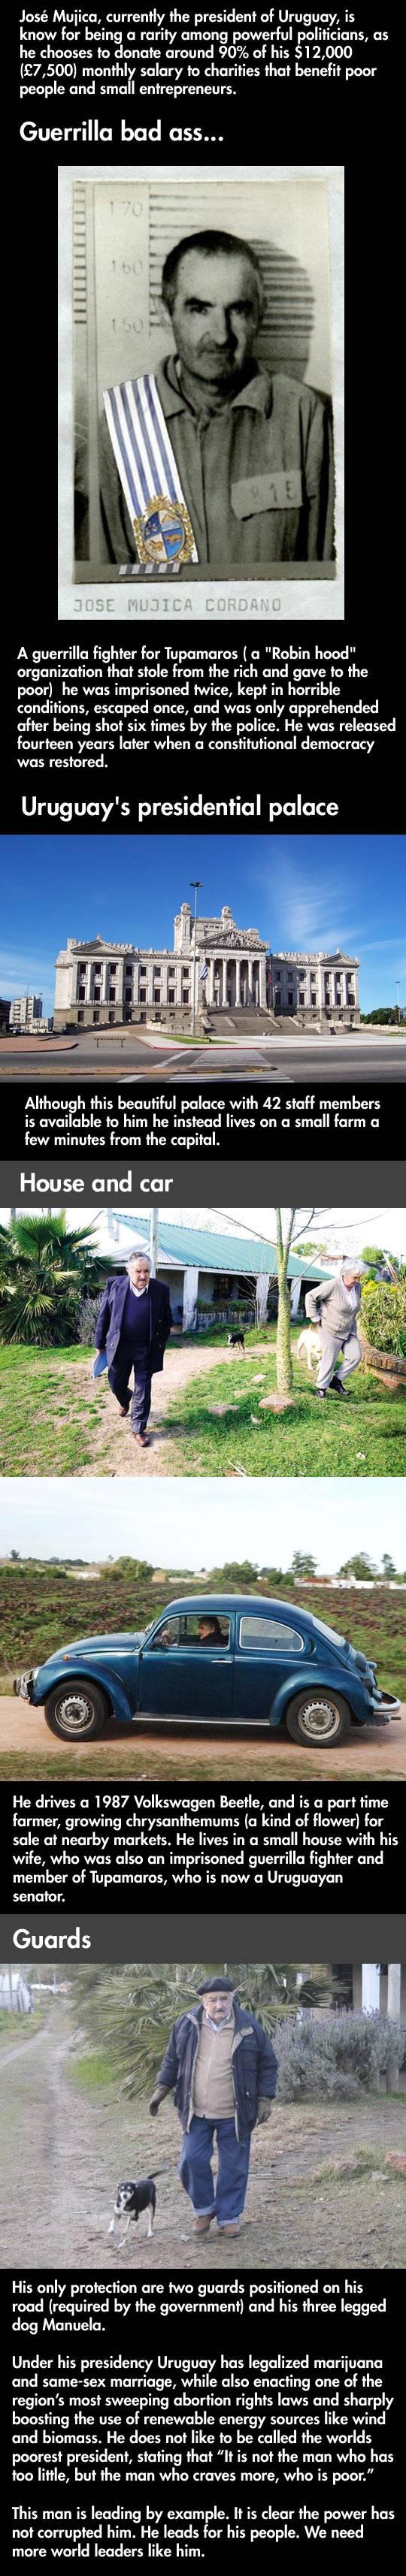 44982-ilyke.net-large-cool-Uruguay-president-Jose-Mujica-poor